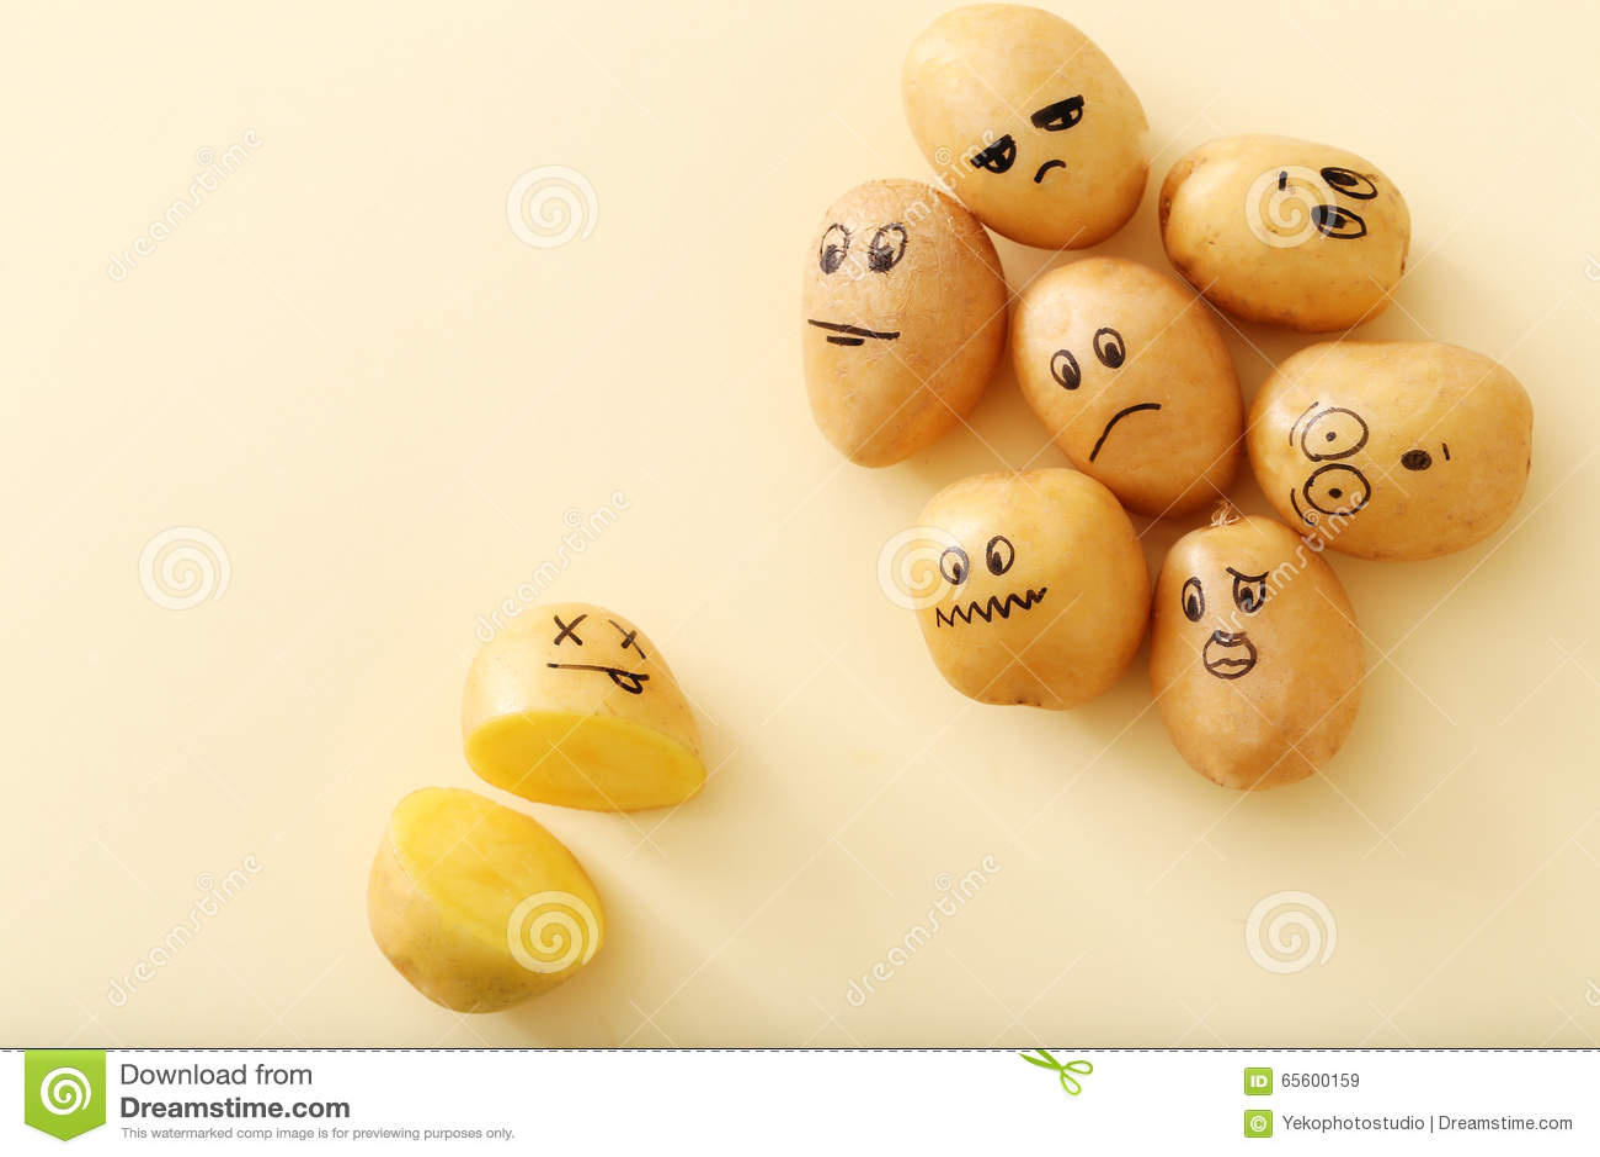 картинки картошка смешная